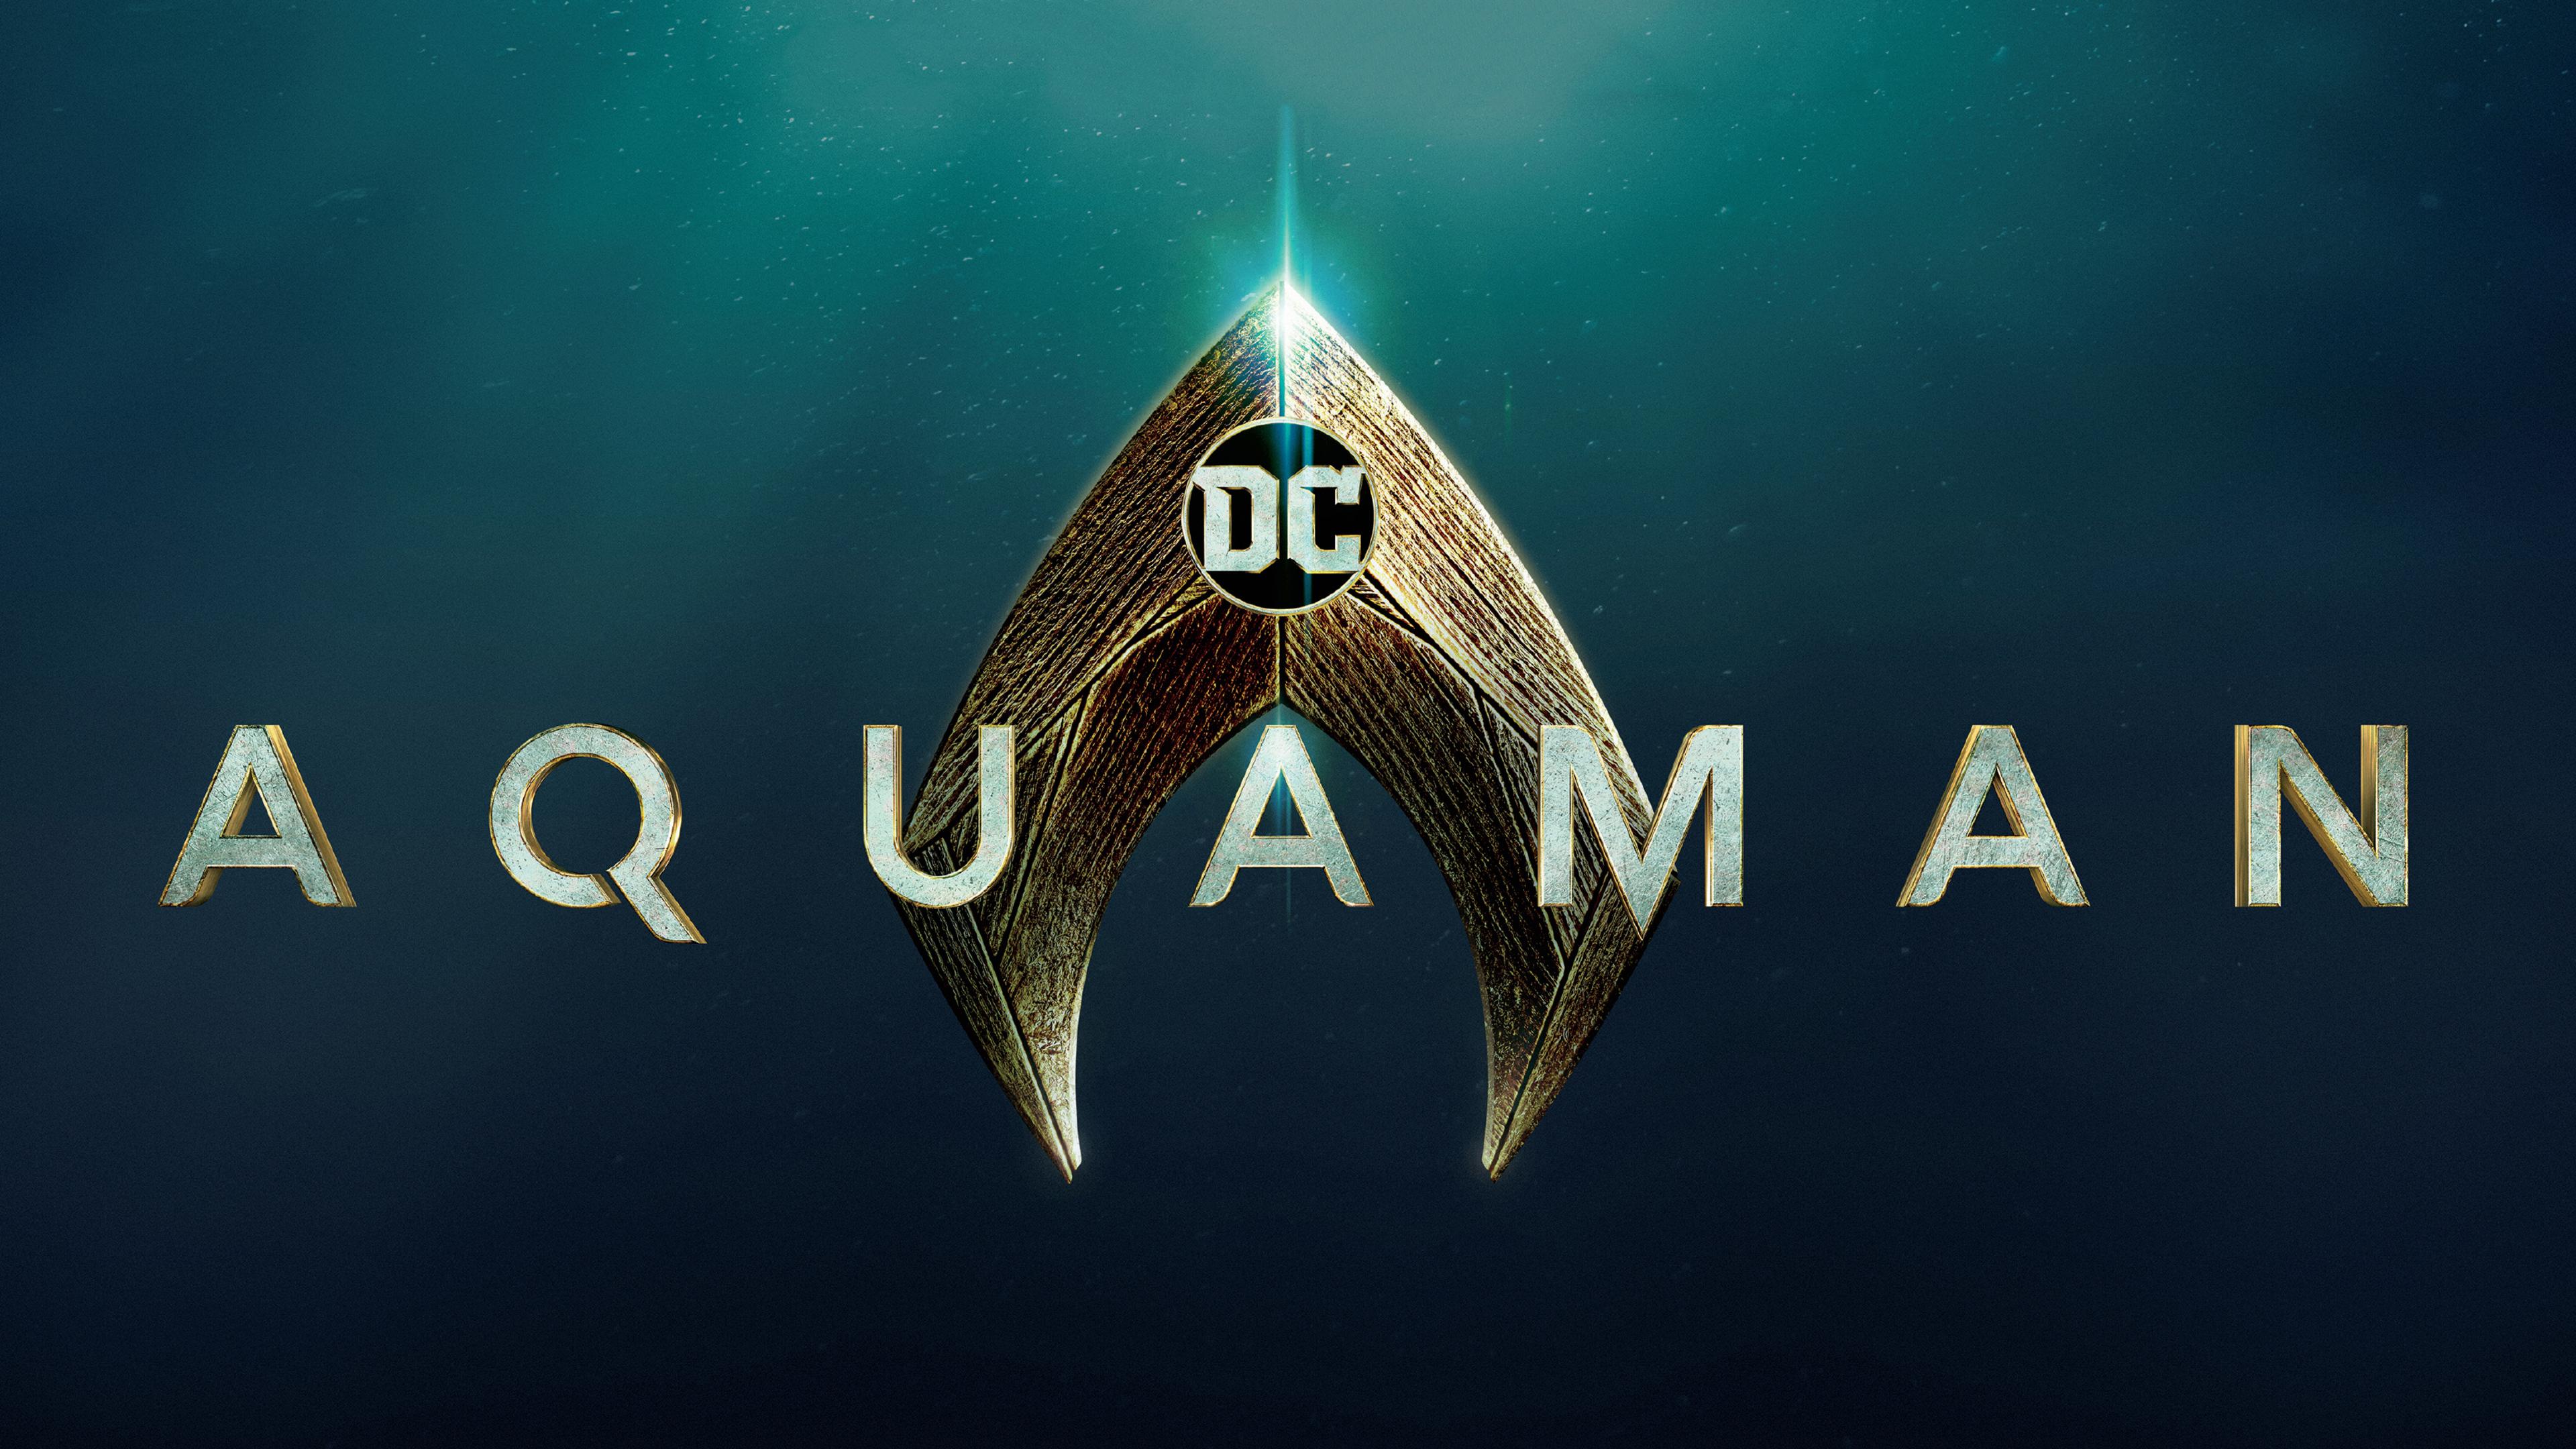 aquaman movie logo uu 3840x2160 - Aquaman Logo movie 4k - aquaman wallpapers 4k, Aquaman Logo movie 4k, Aquaman 4k logo